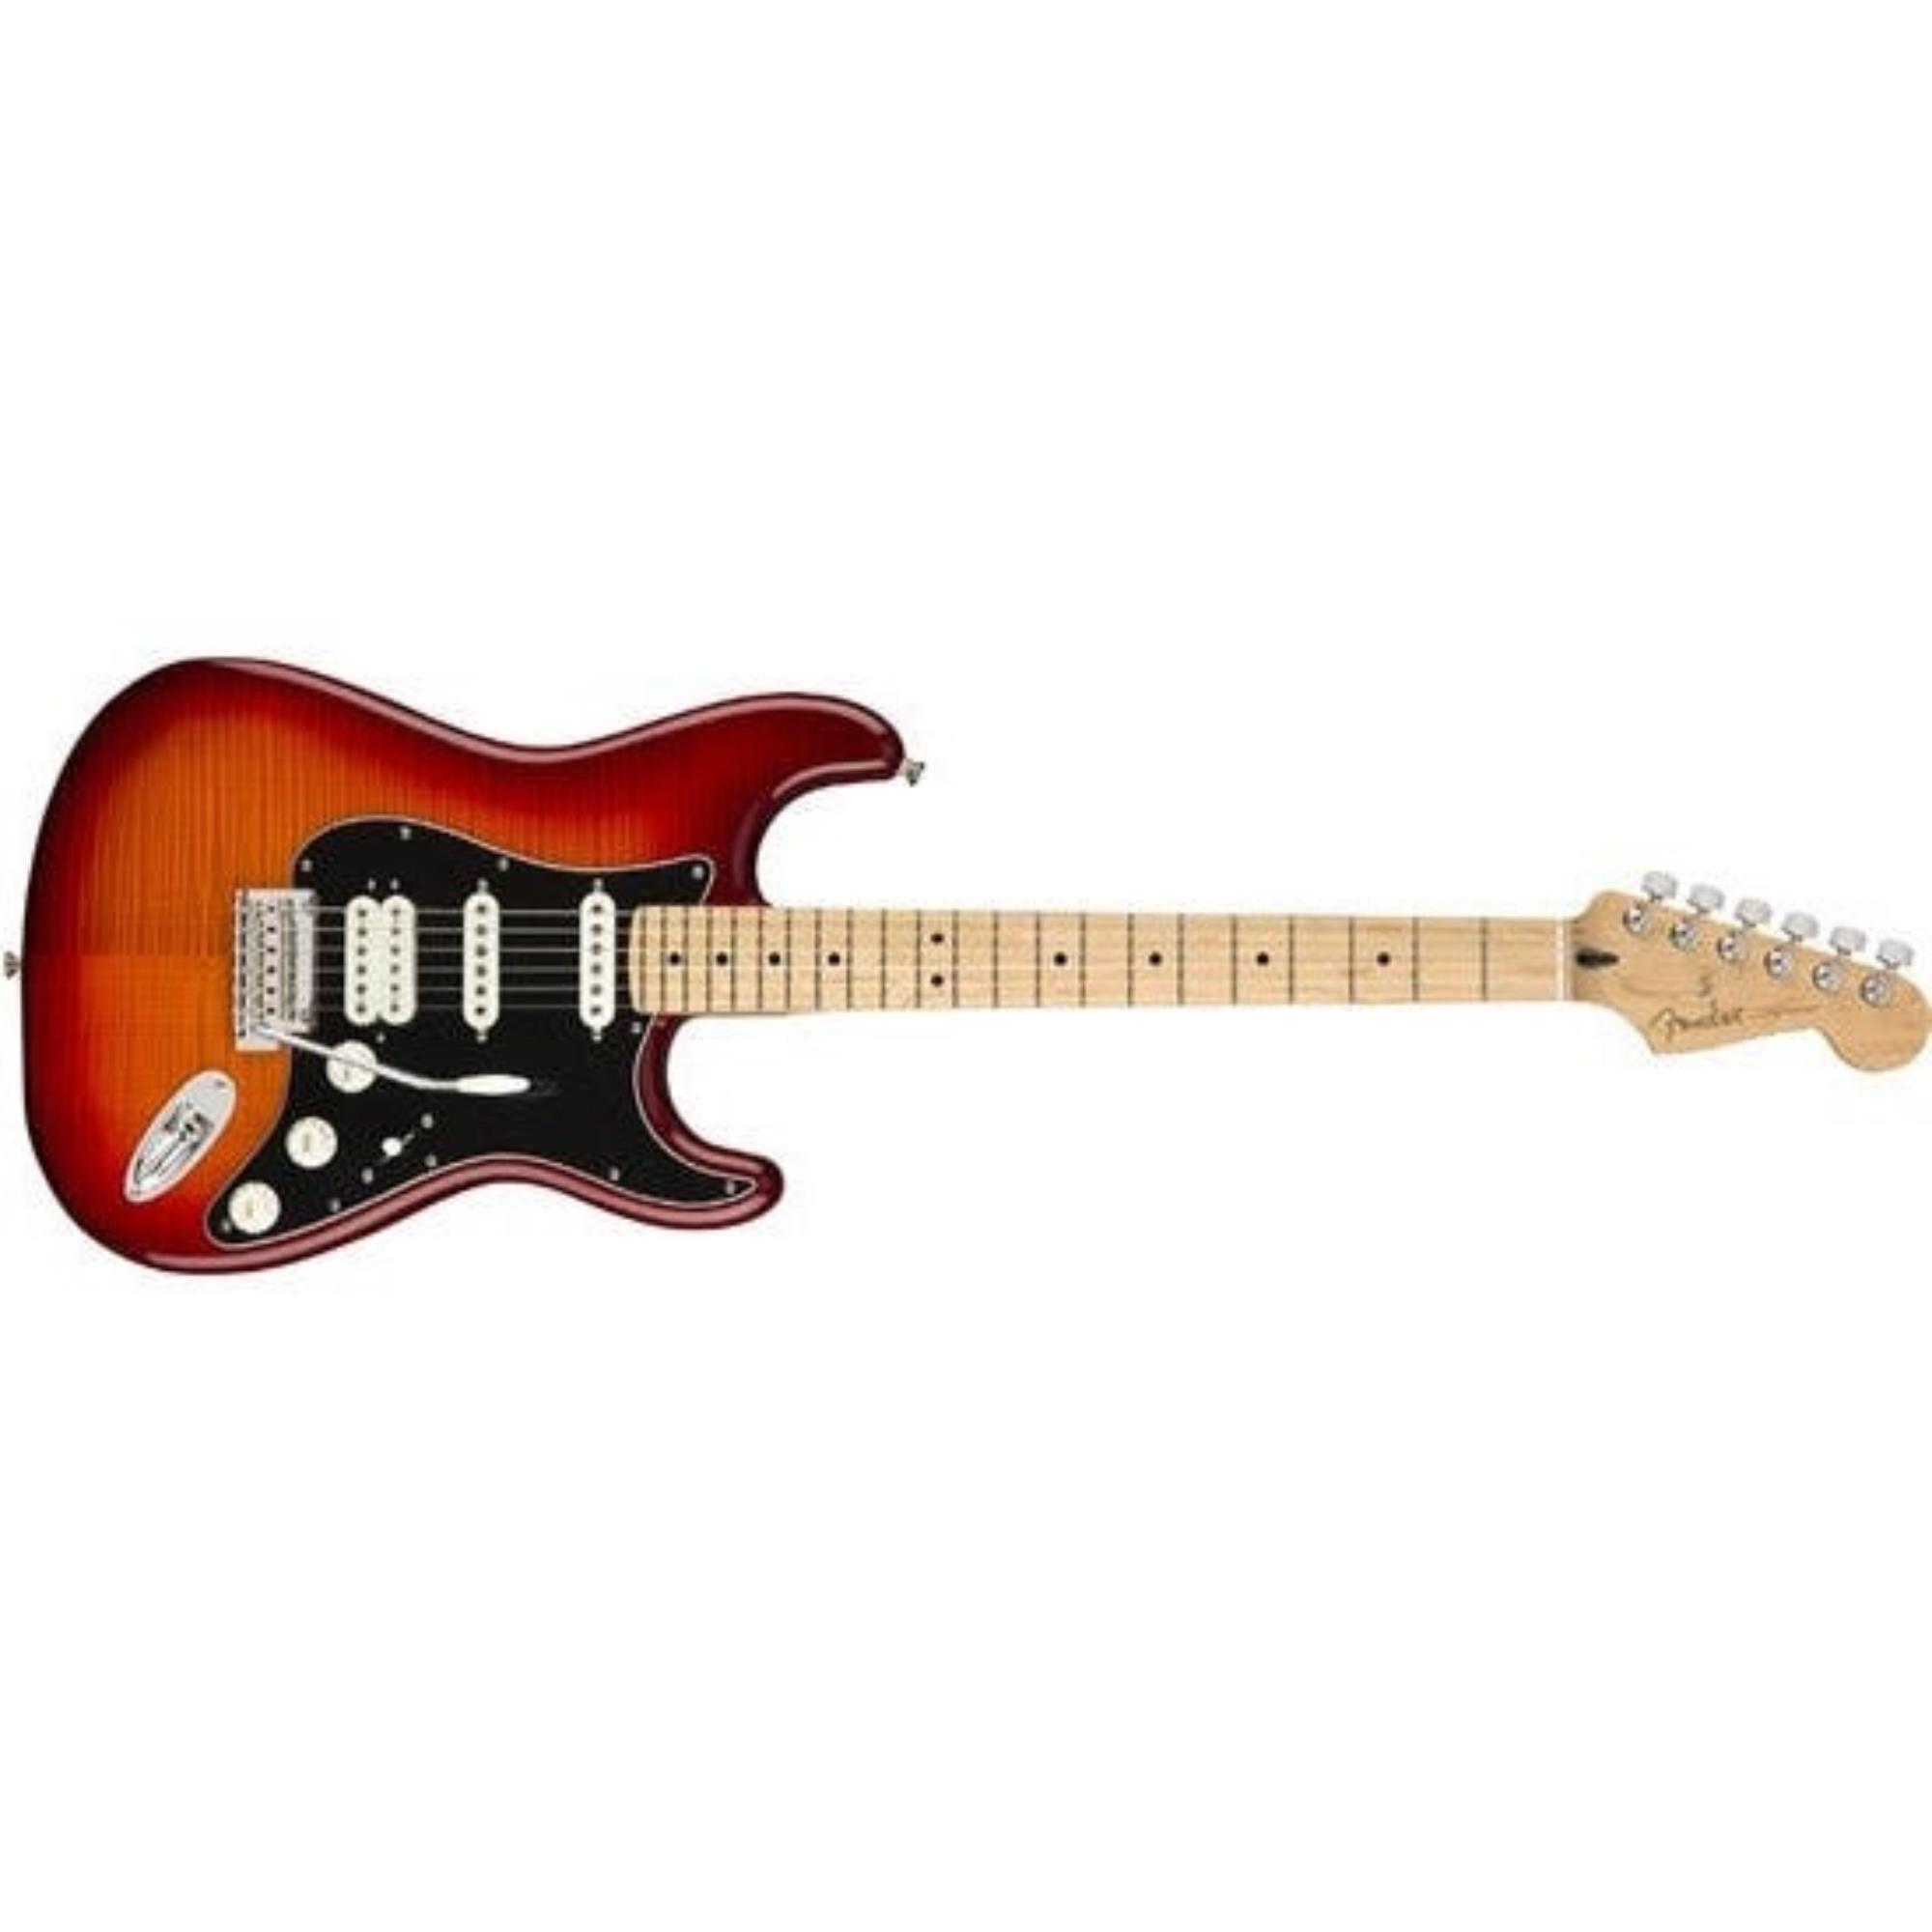 FENDER-Player-Stratocaster-HSS-Plus-Top-MN-Aged-Cherry-Burst-0144562531-sku-24653